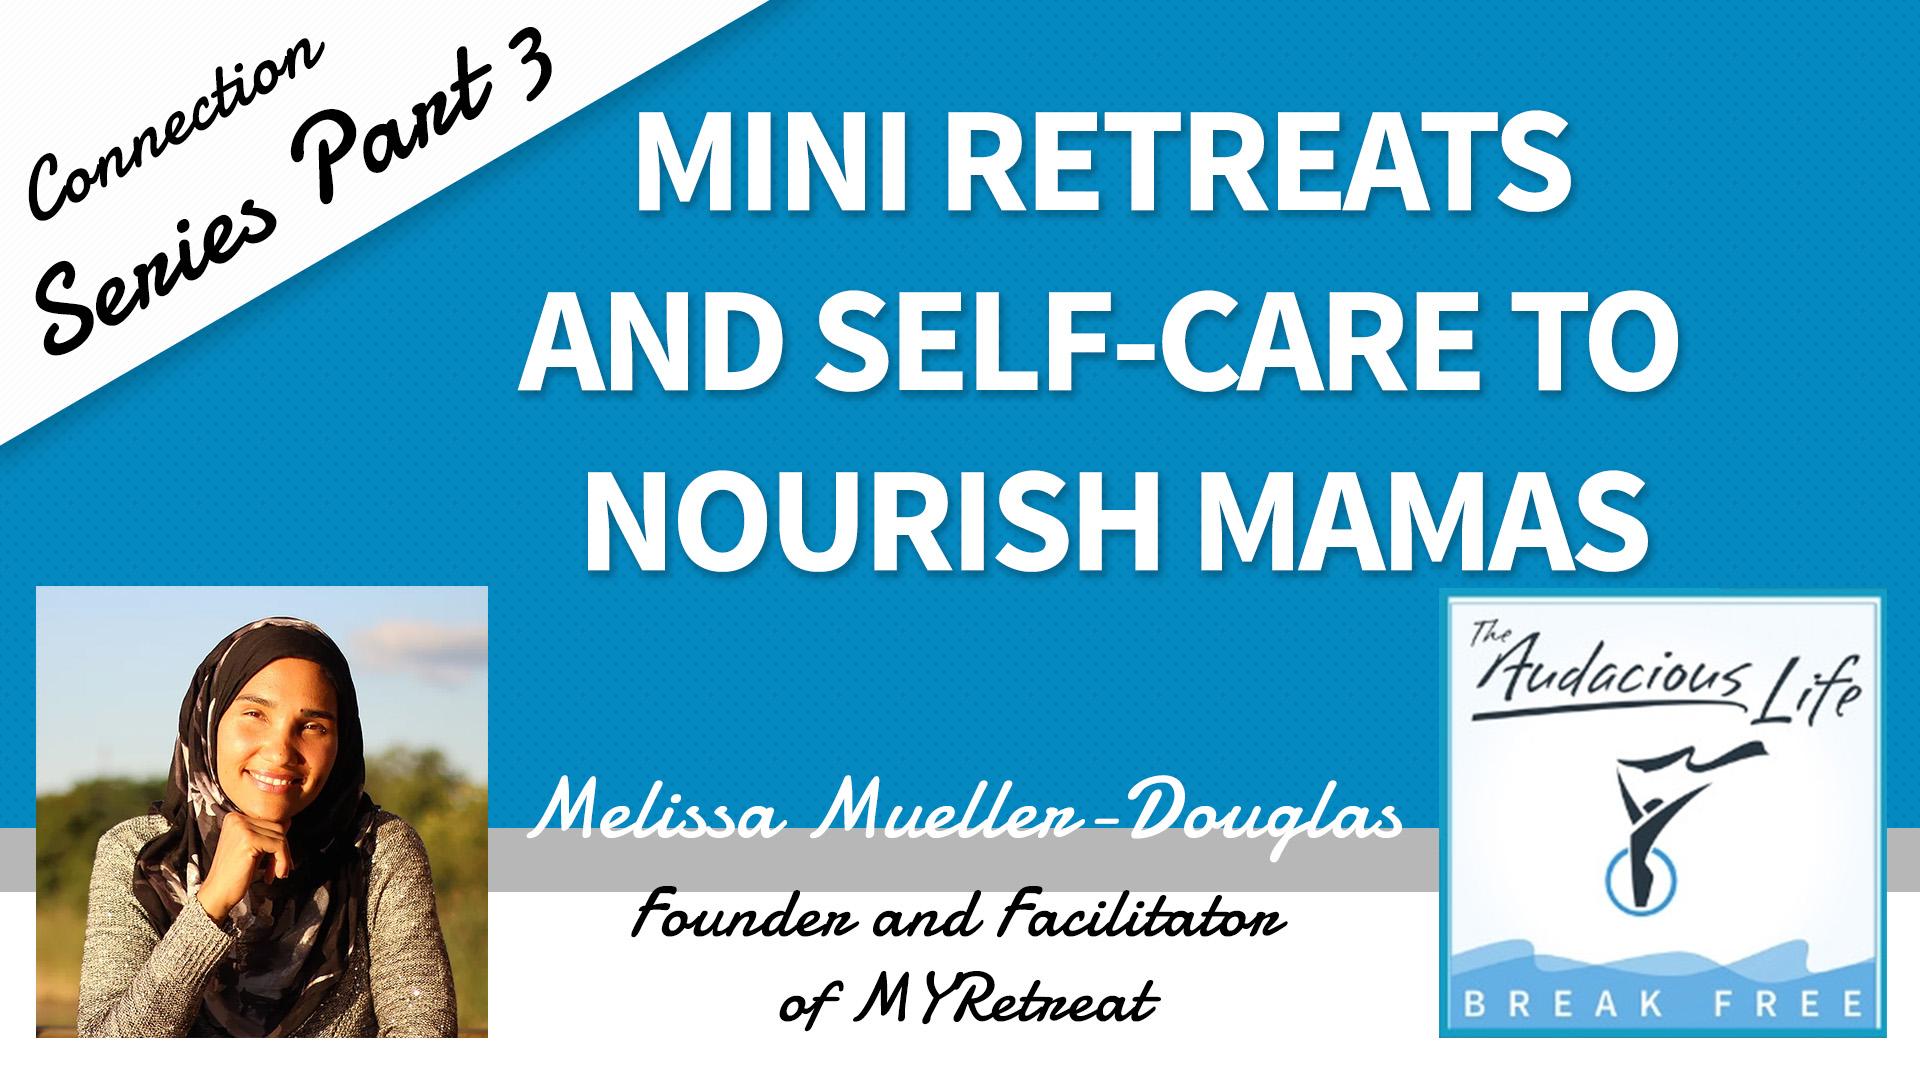 Mini Retreats and Self-Care to Nourish Mamas with Melissa Mueller-Douglas